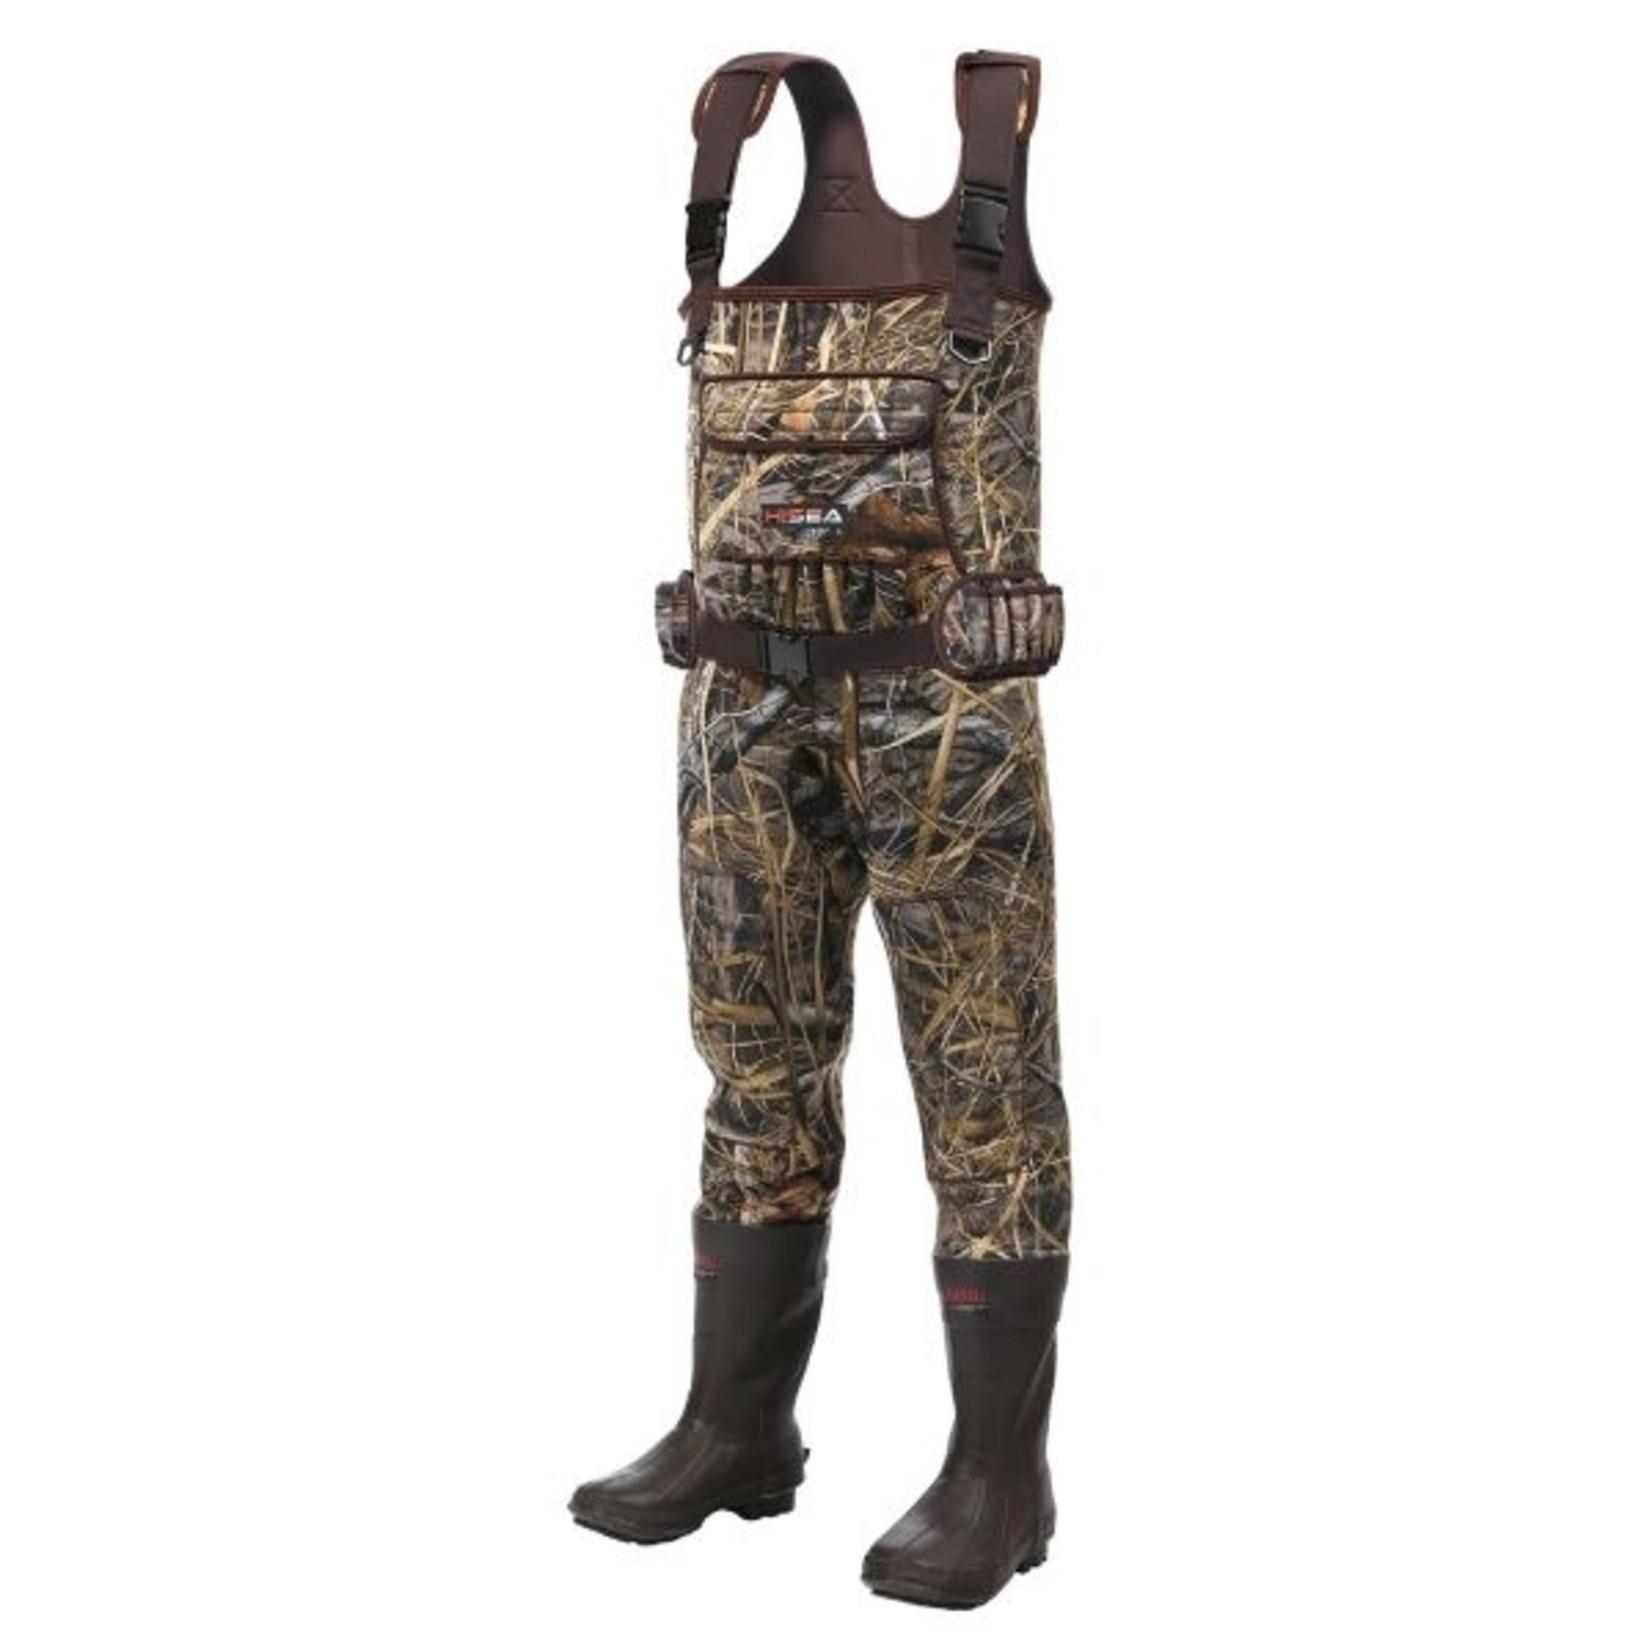 Hisea Men's Wader Size 42 -Size 9 boots -open box